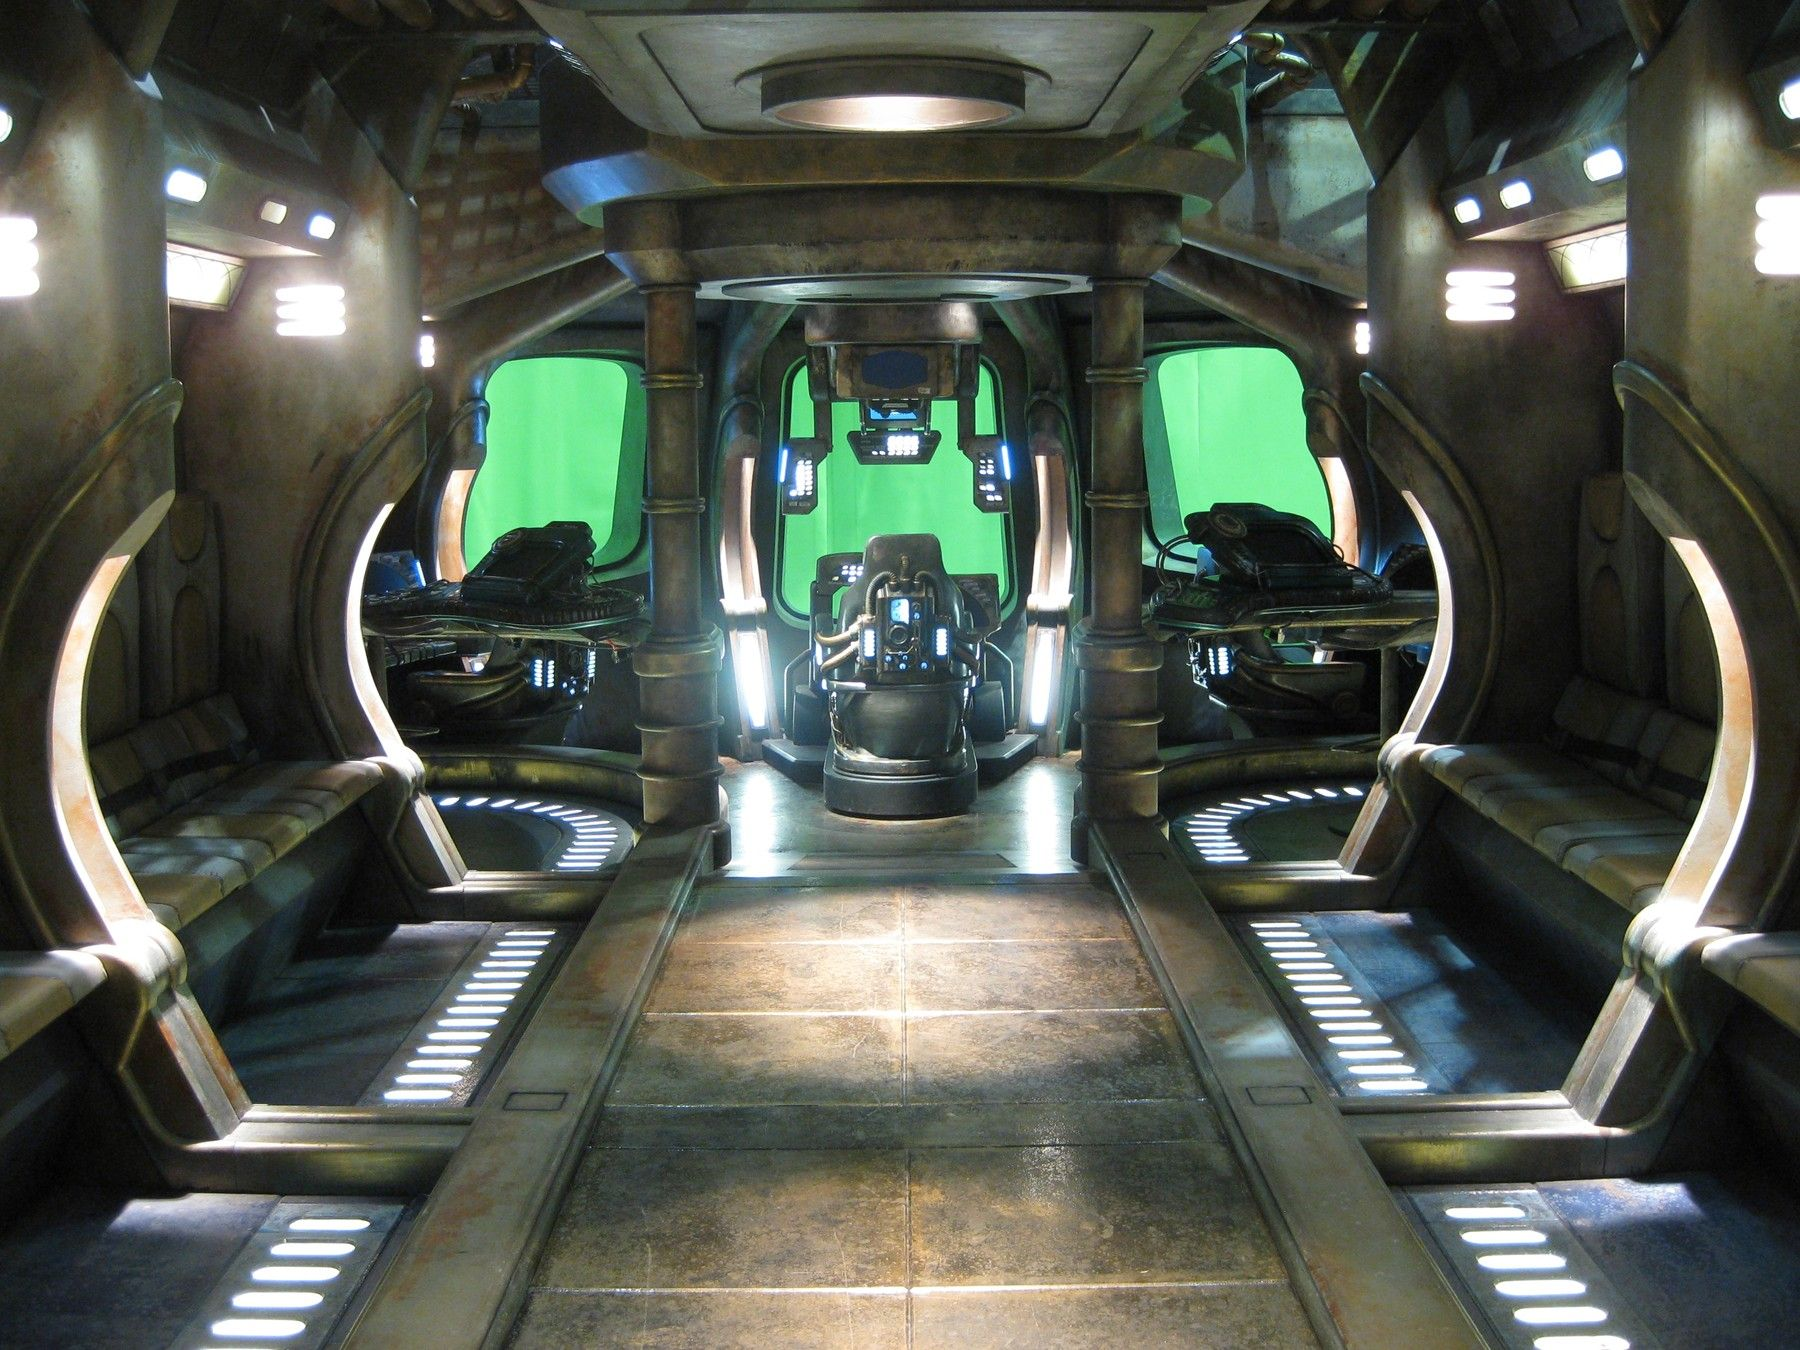 space shuttle interior design - photo #14